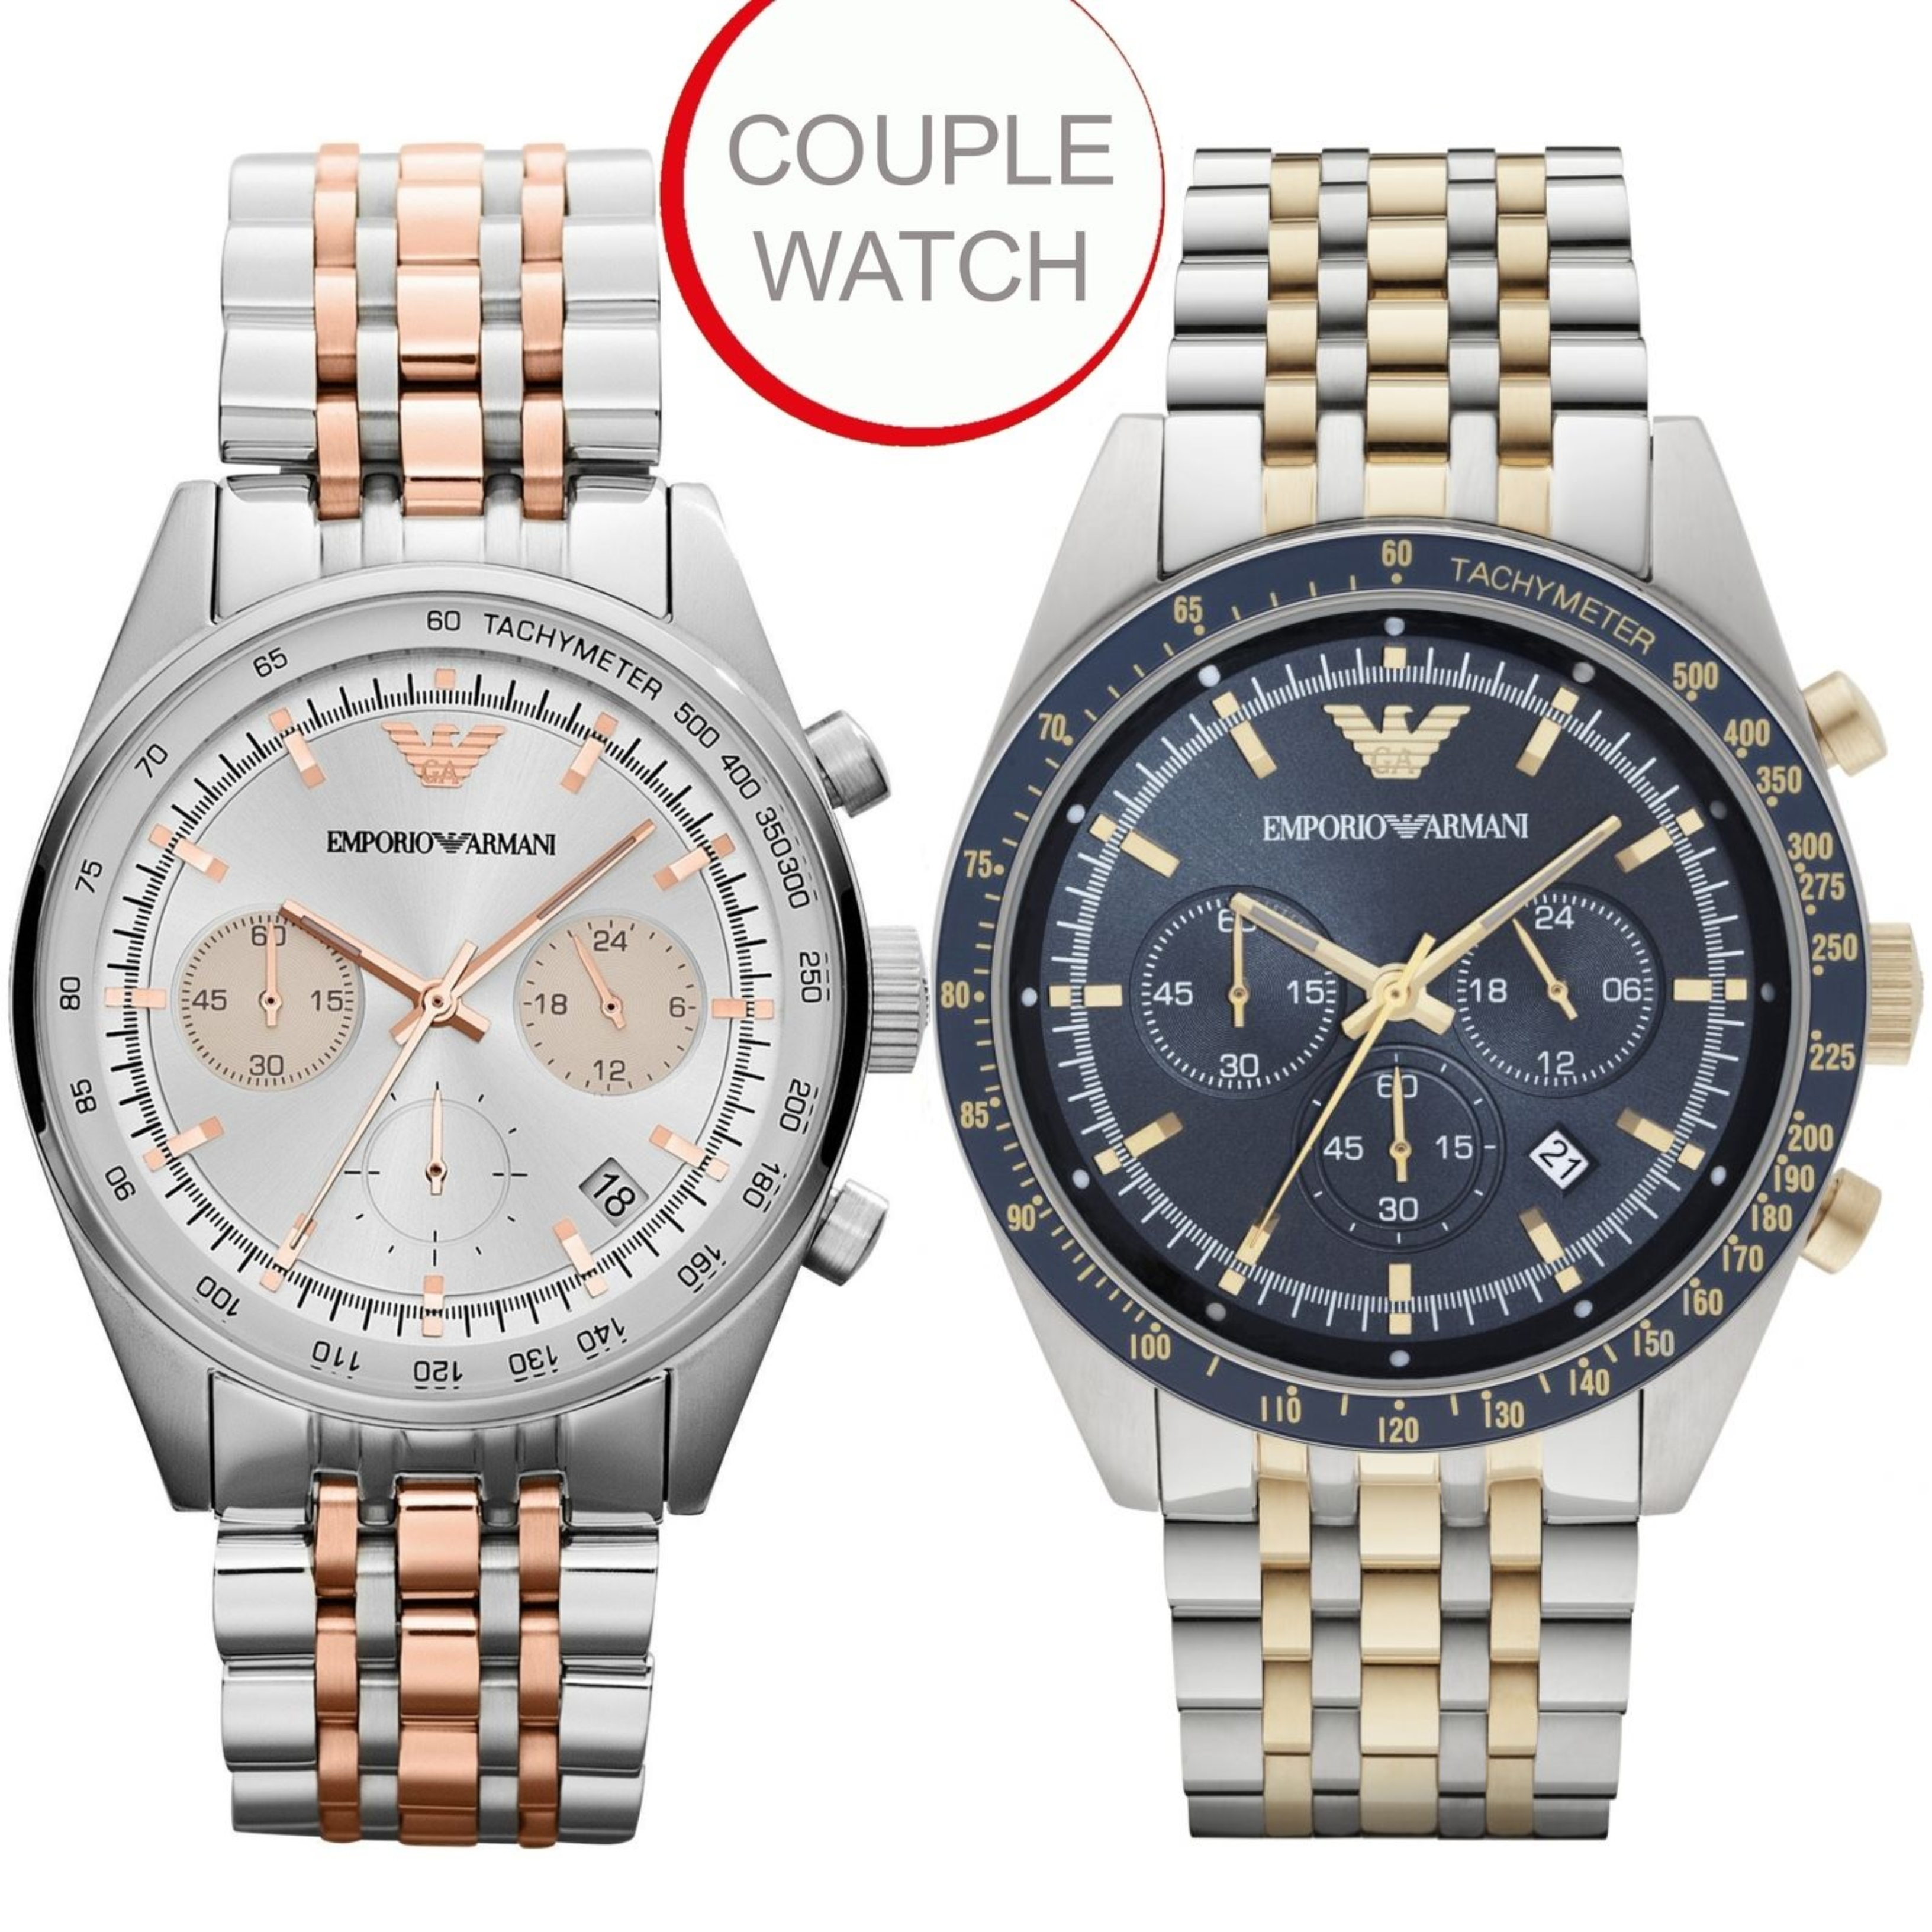 ab8364530adc2 Emporio Armani Sportivo Couple Watch|Duel Tone|Chronograph|Christmas Combo  Deal | Sustuu